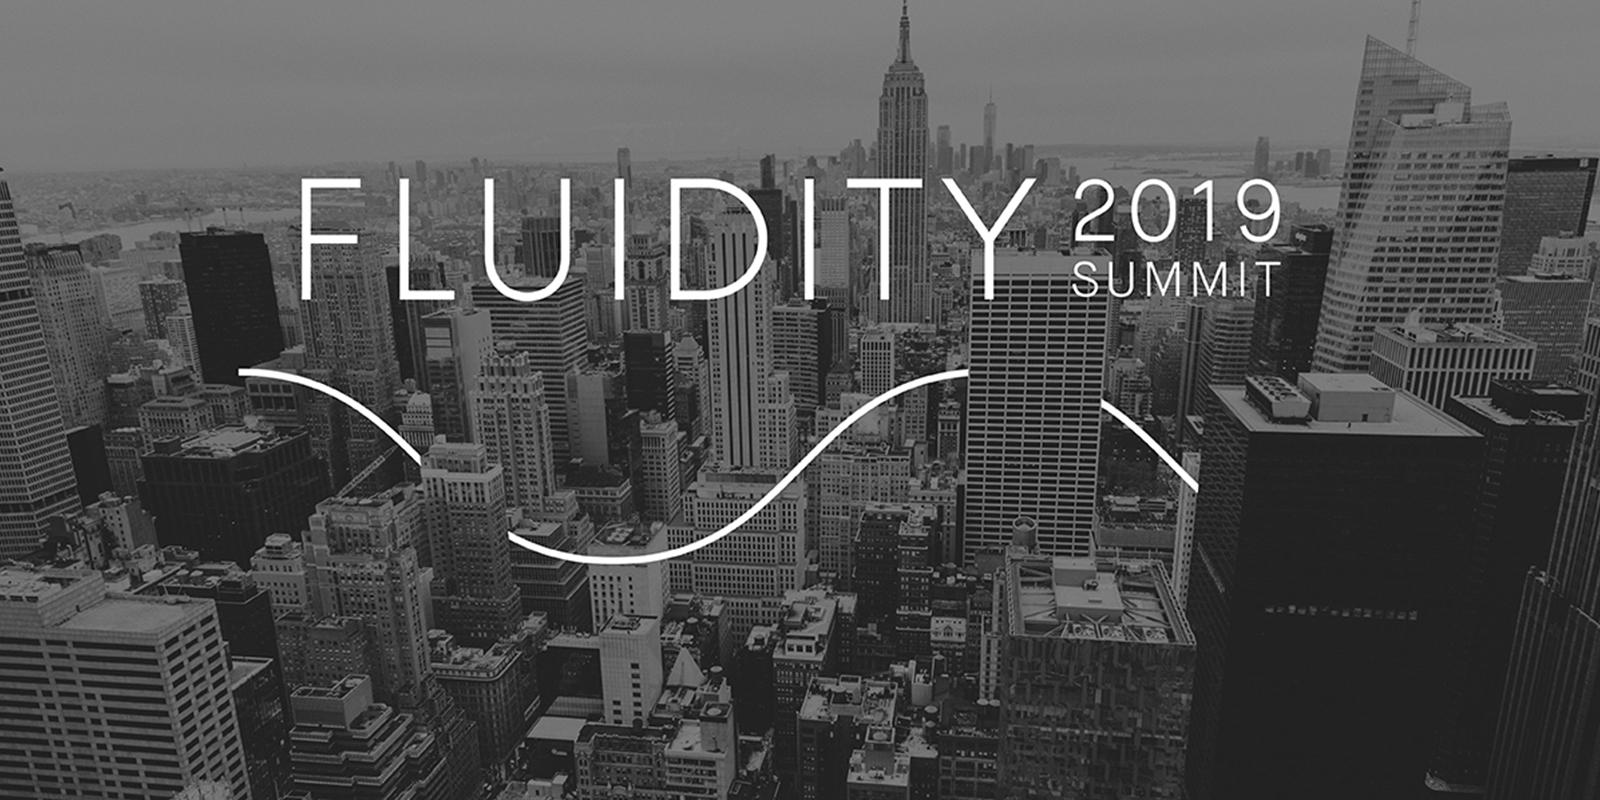 Fluidity Summit 2019